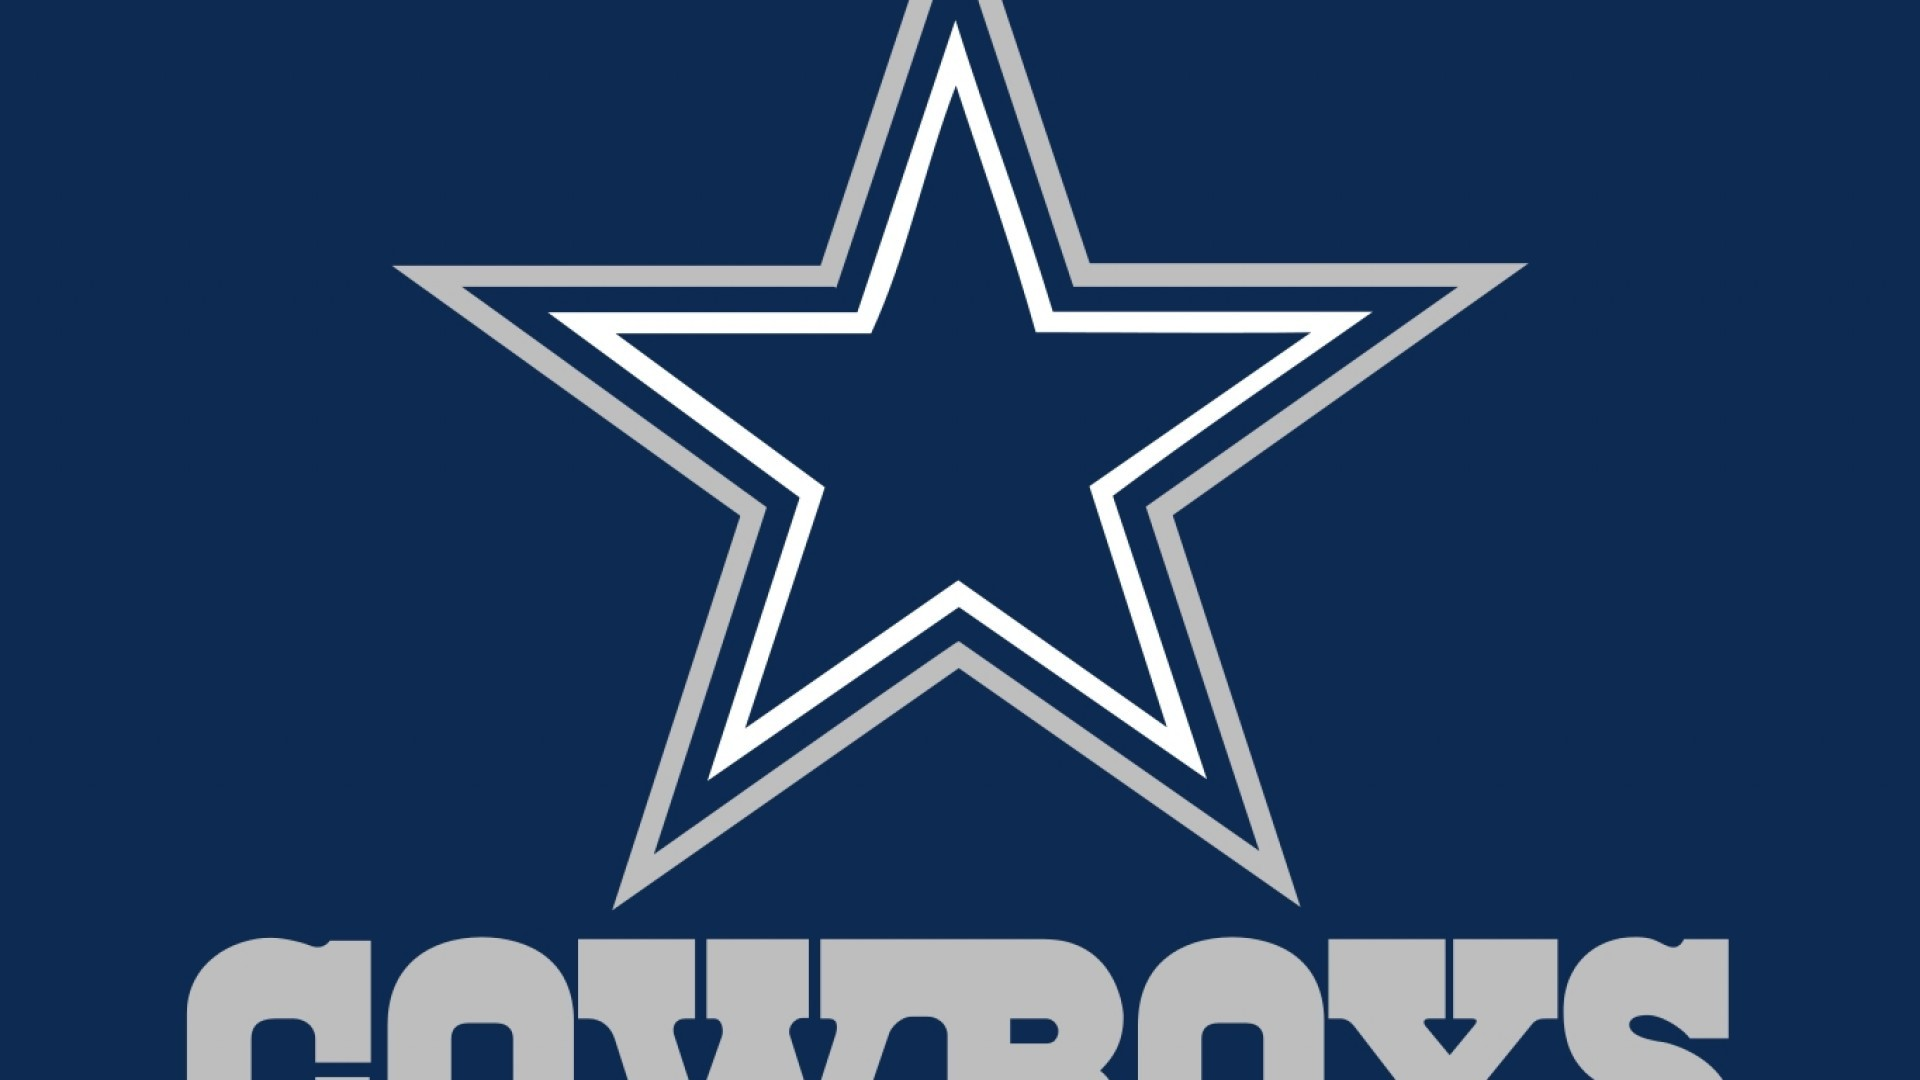 Dallas Cowboys Star wallpaper